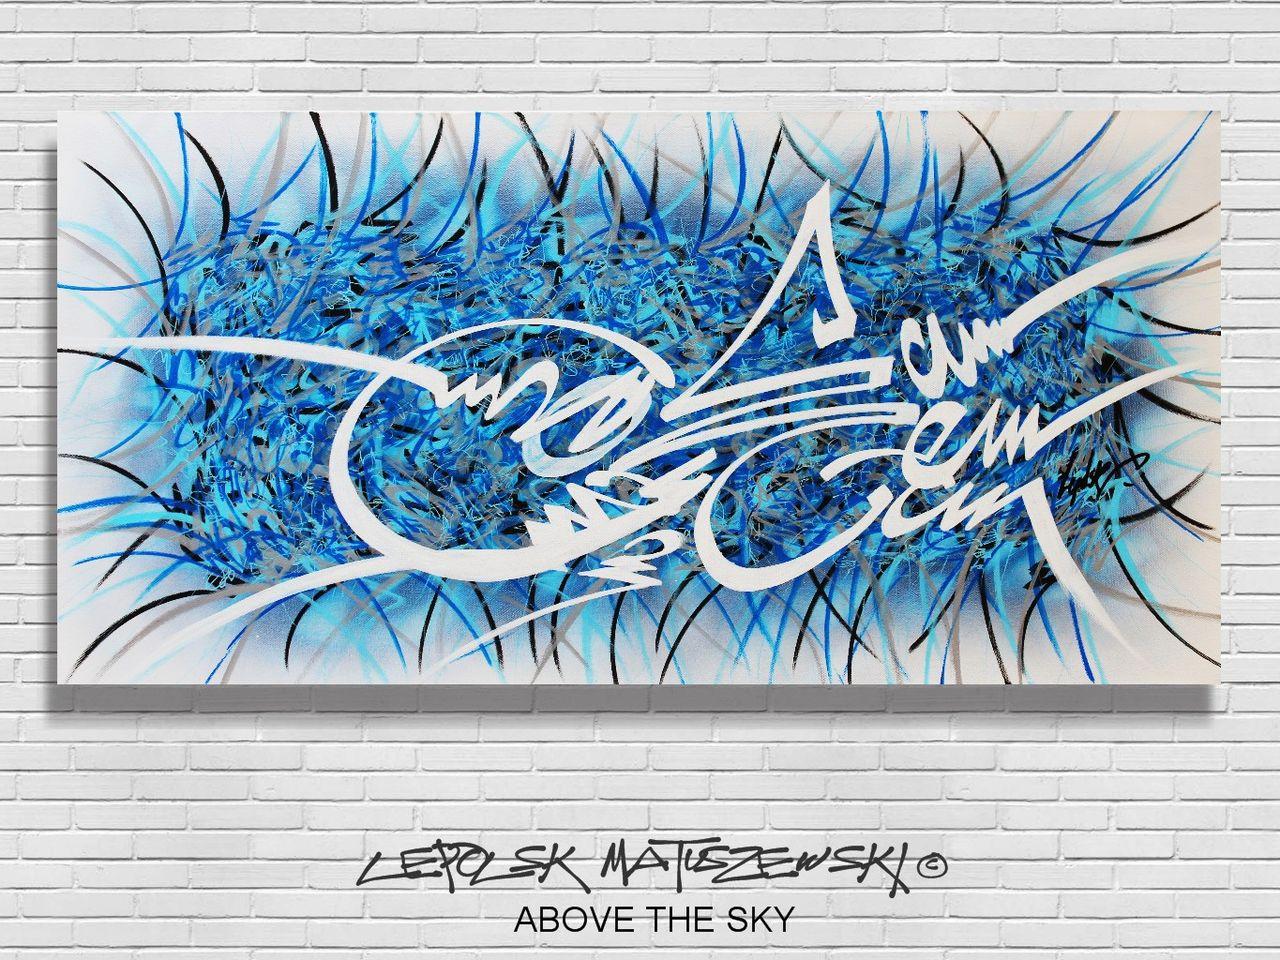 MISTER K  (Lepolsk Matuszewski) ABOVE THE SKY  Calligraffiti abstraite